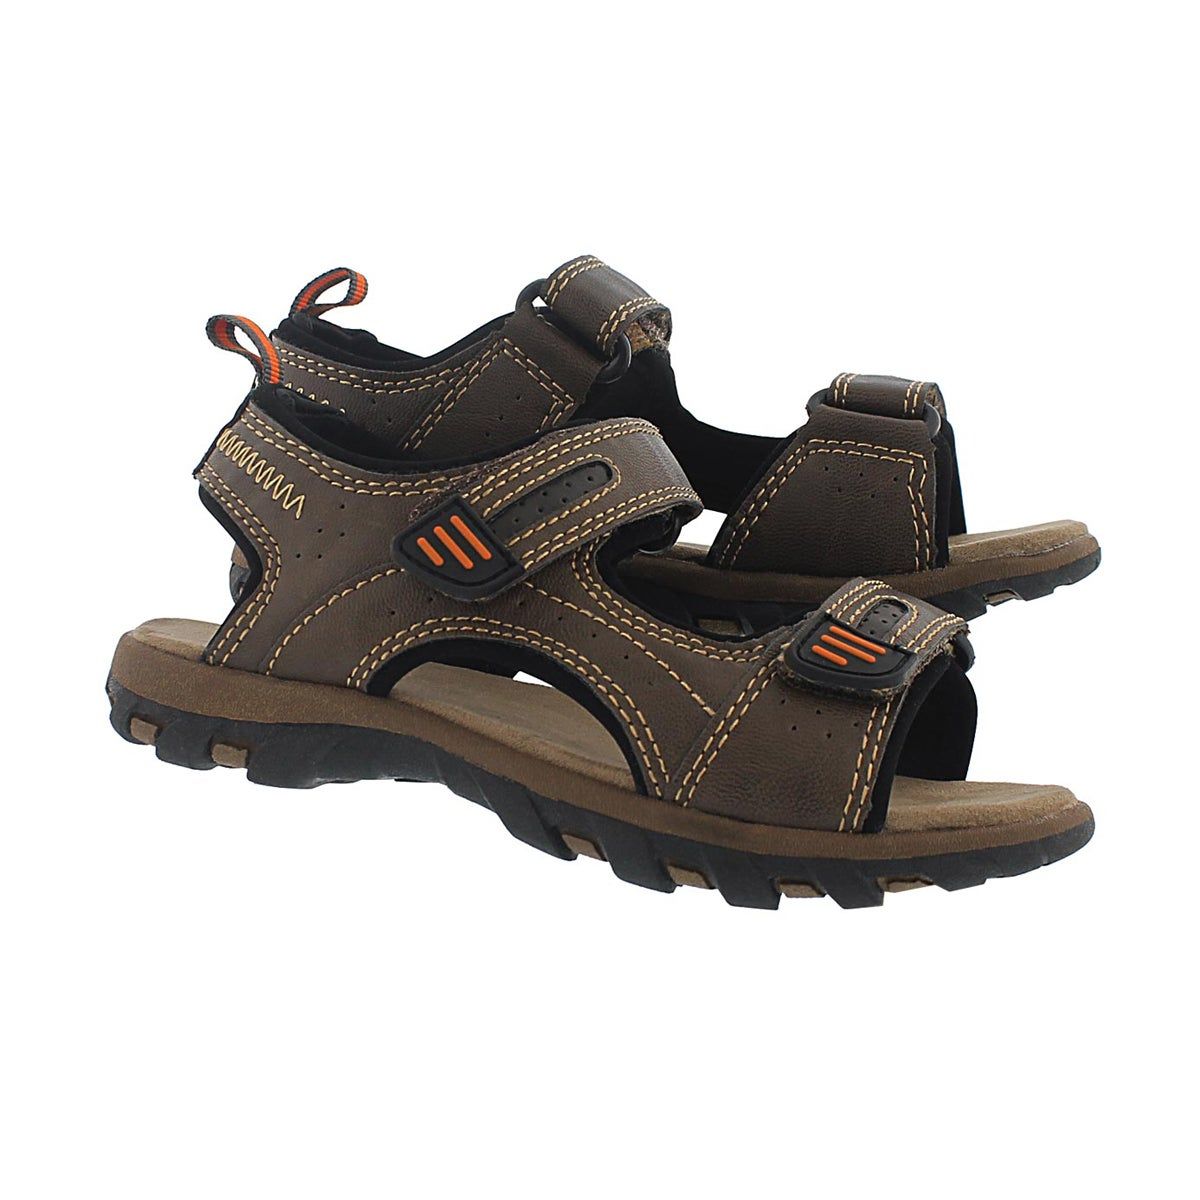 Bys Emmett brown 2 strap sport sandal